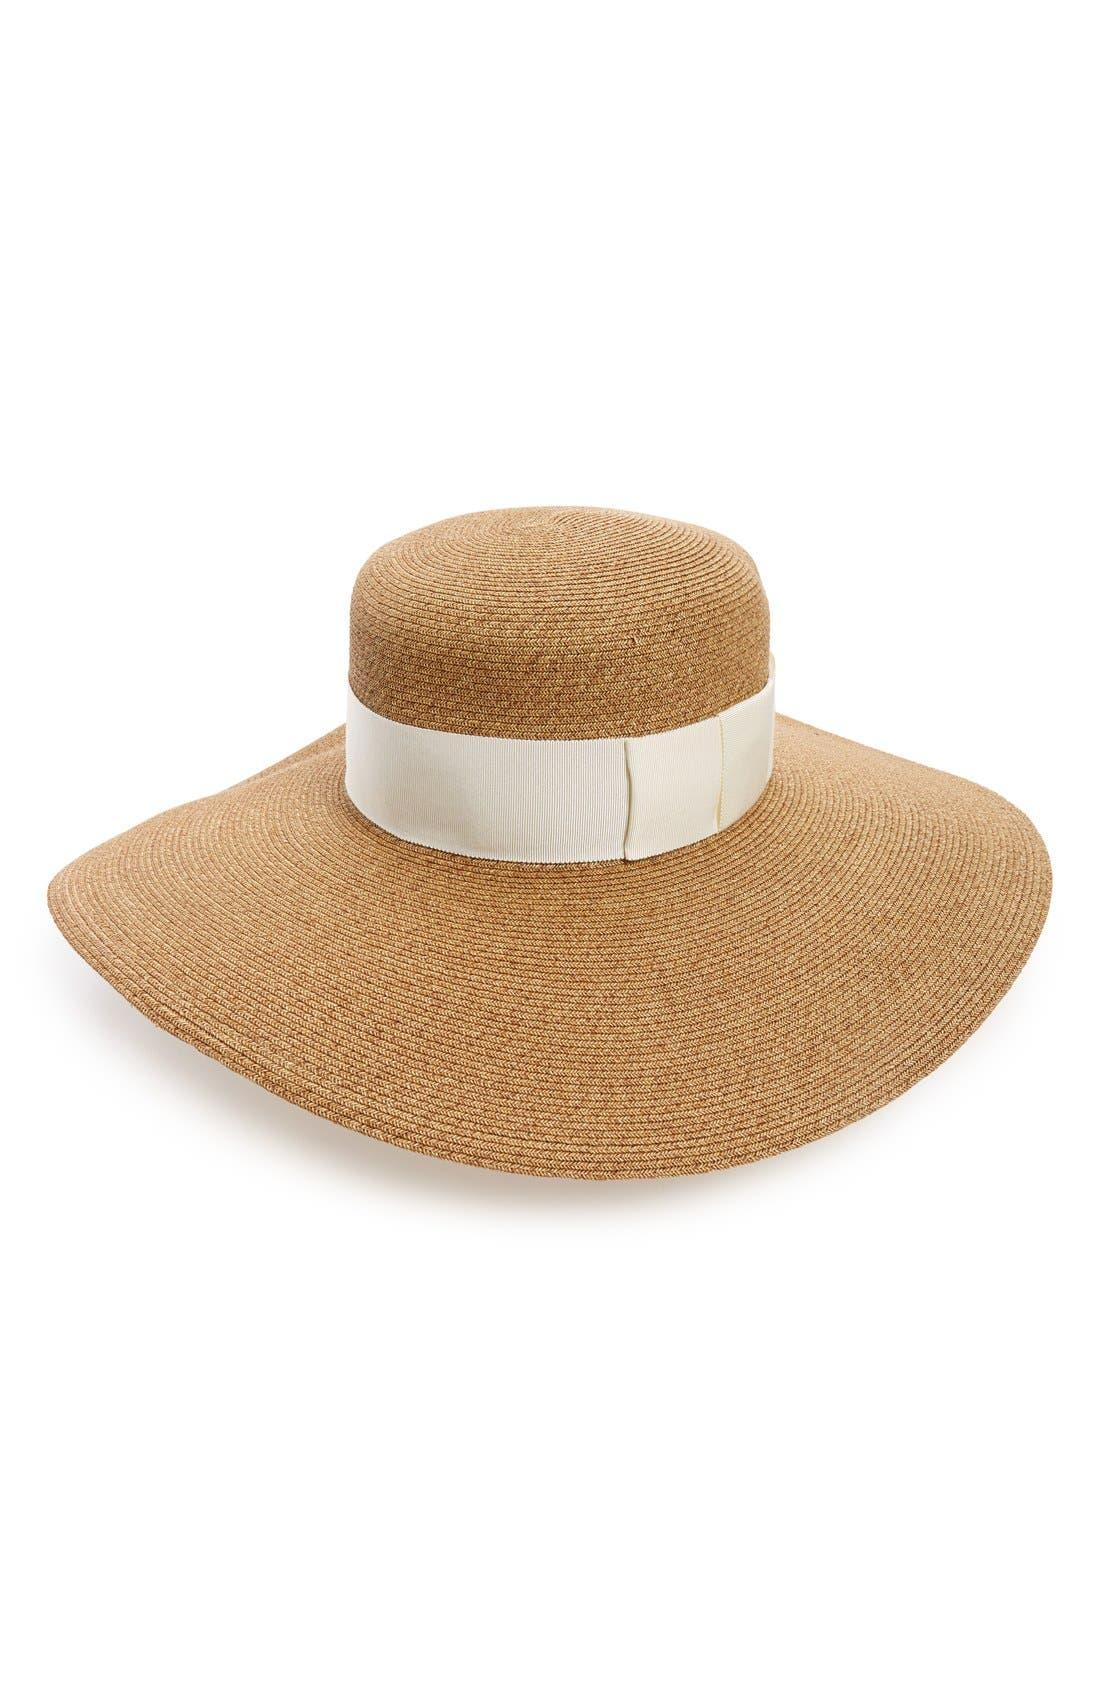 Alternate Image 1 Selected - Eugenina Kim Straw Sun Hat